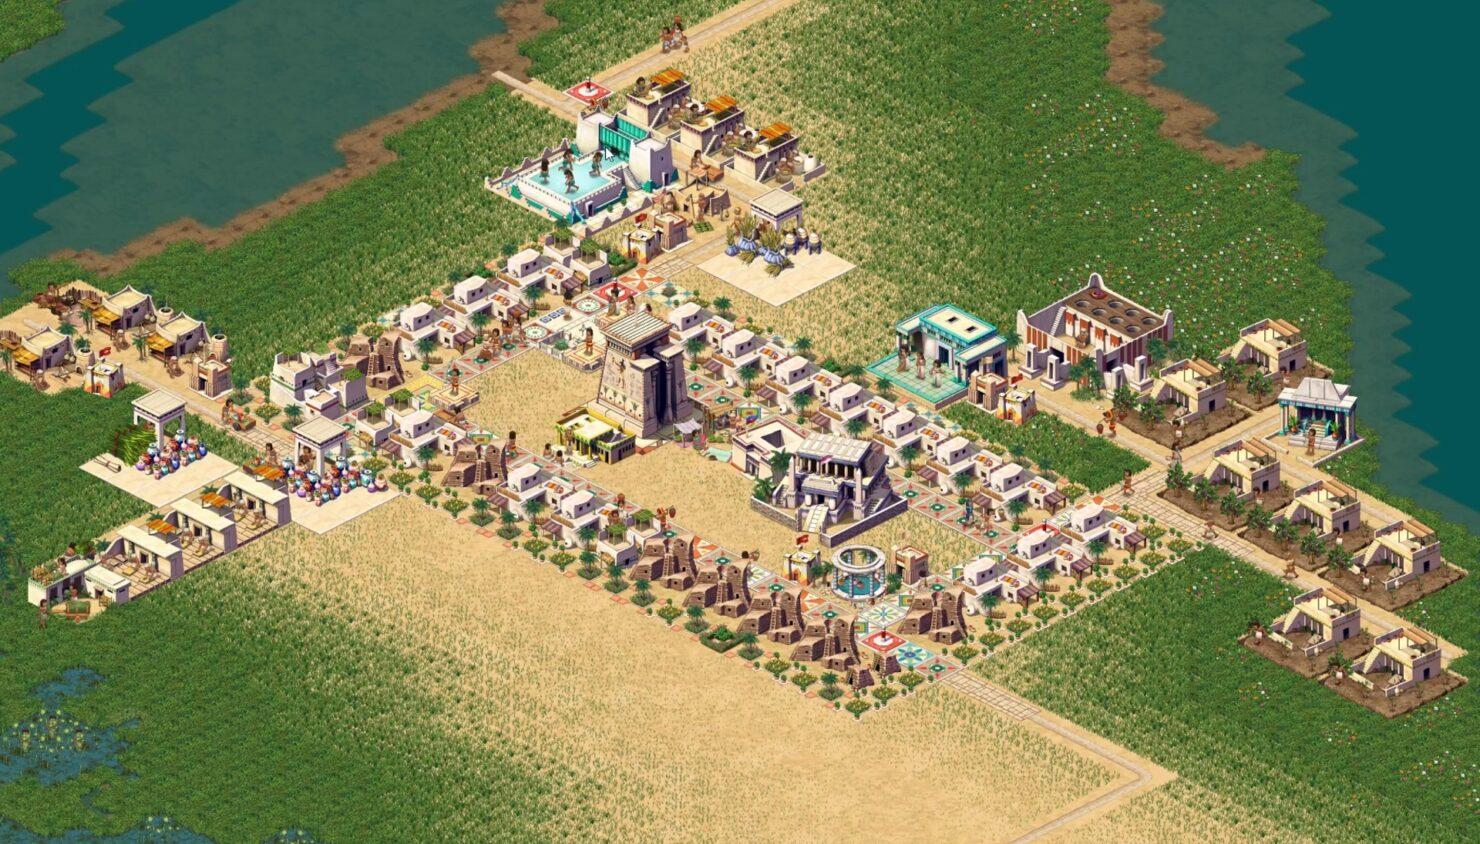 pharaoh-a-new-era-preview-04-screenshot-3